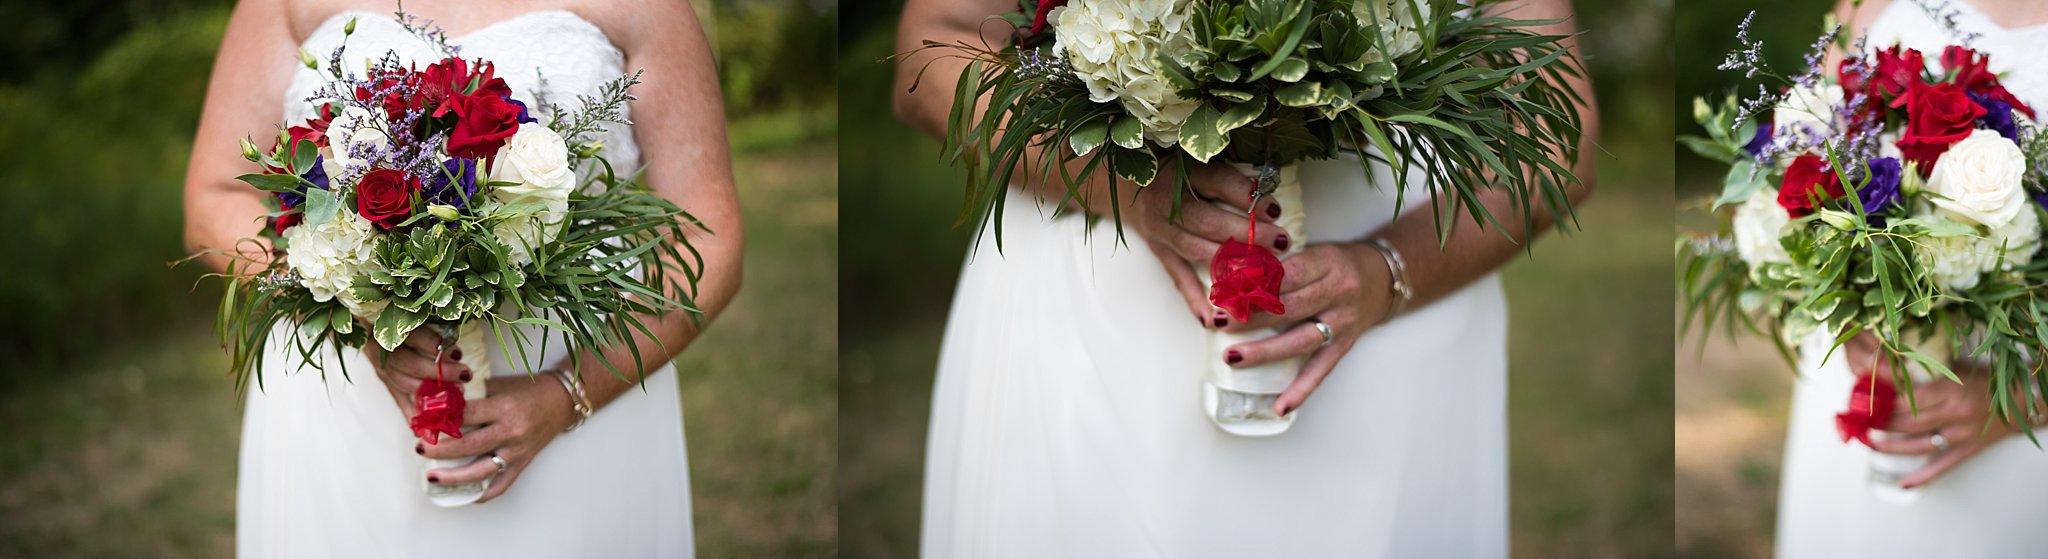 new england summer weddings.jpg